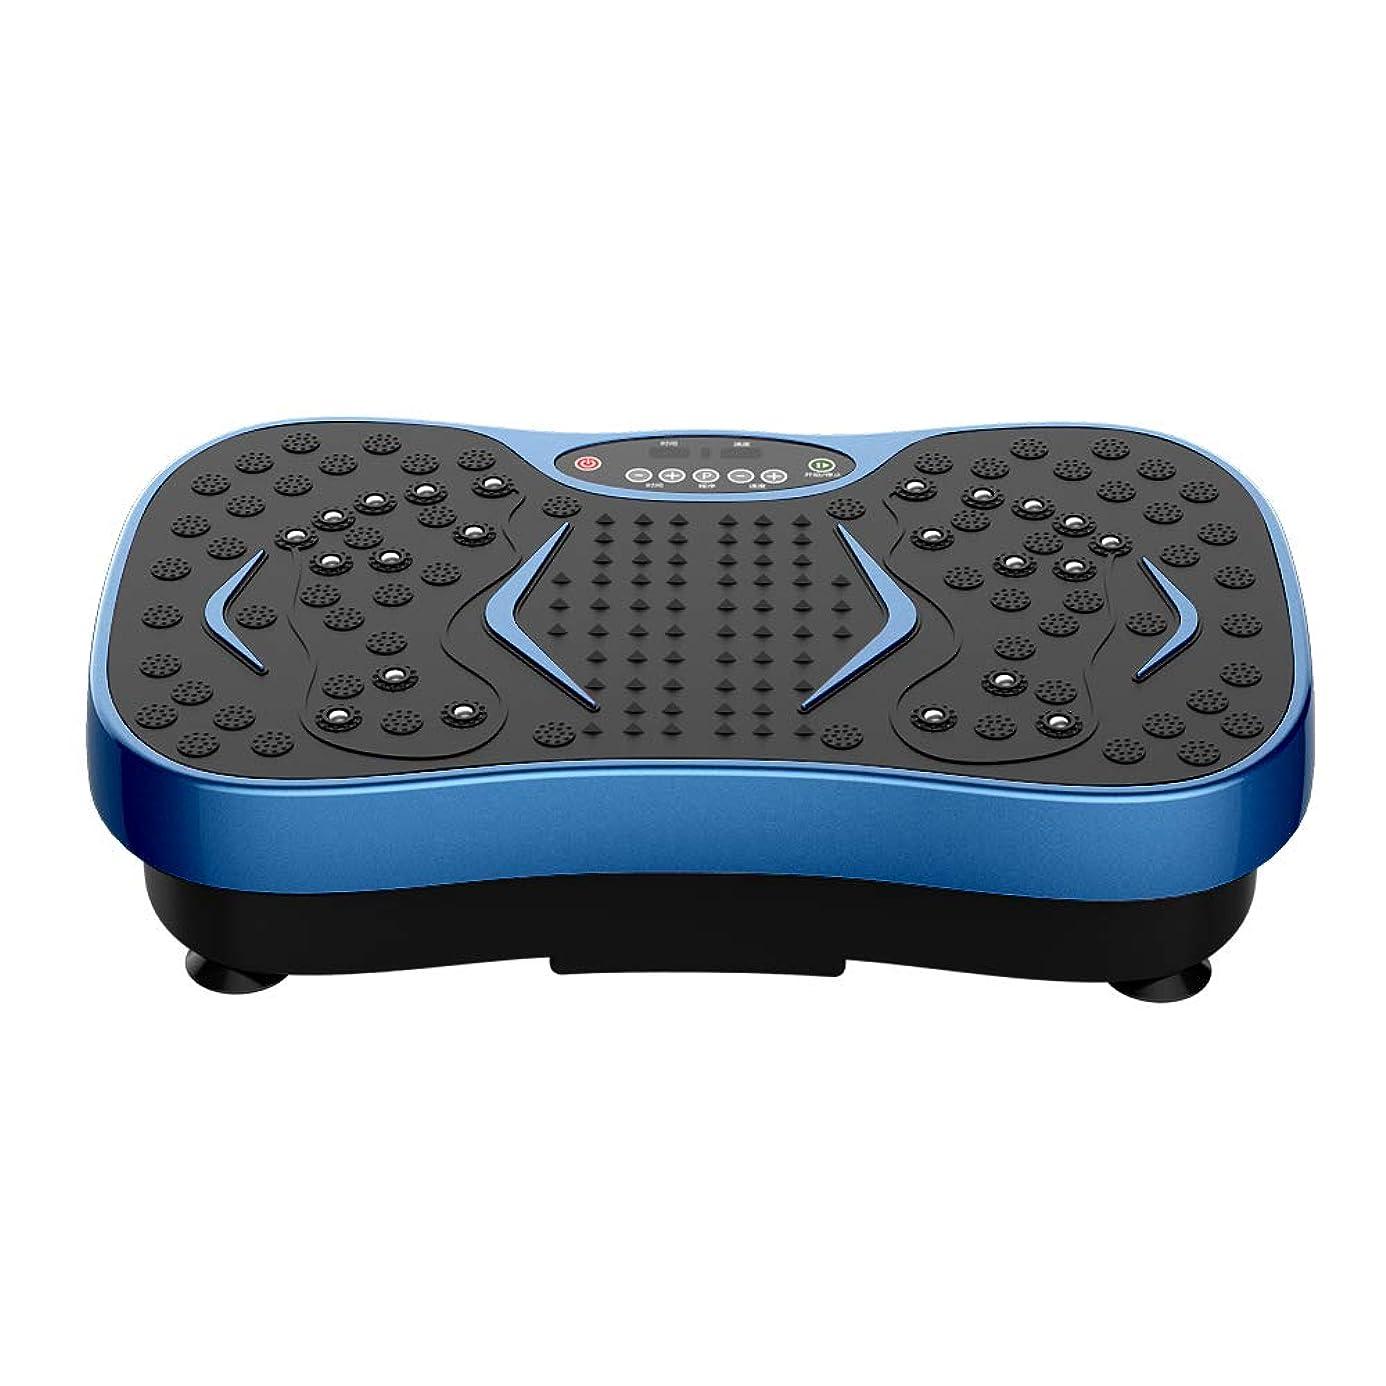 JUFIT Fitness Machine Whole Full Body Shape Exercise Machine Vibration Plate Fit Massage Workout Trainer Vibration Platform Machine,Max User Weight 330lbs